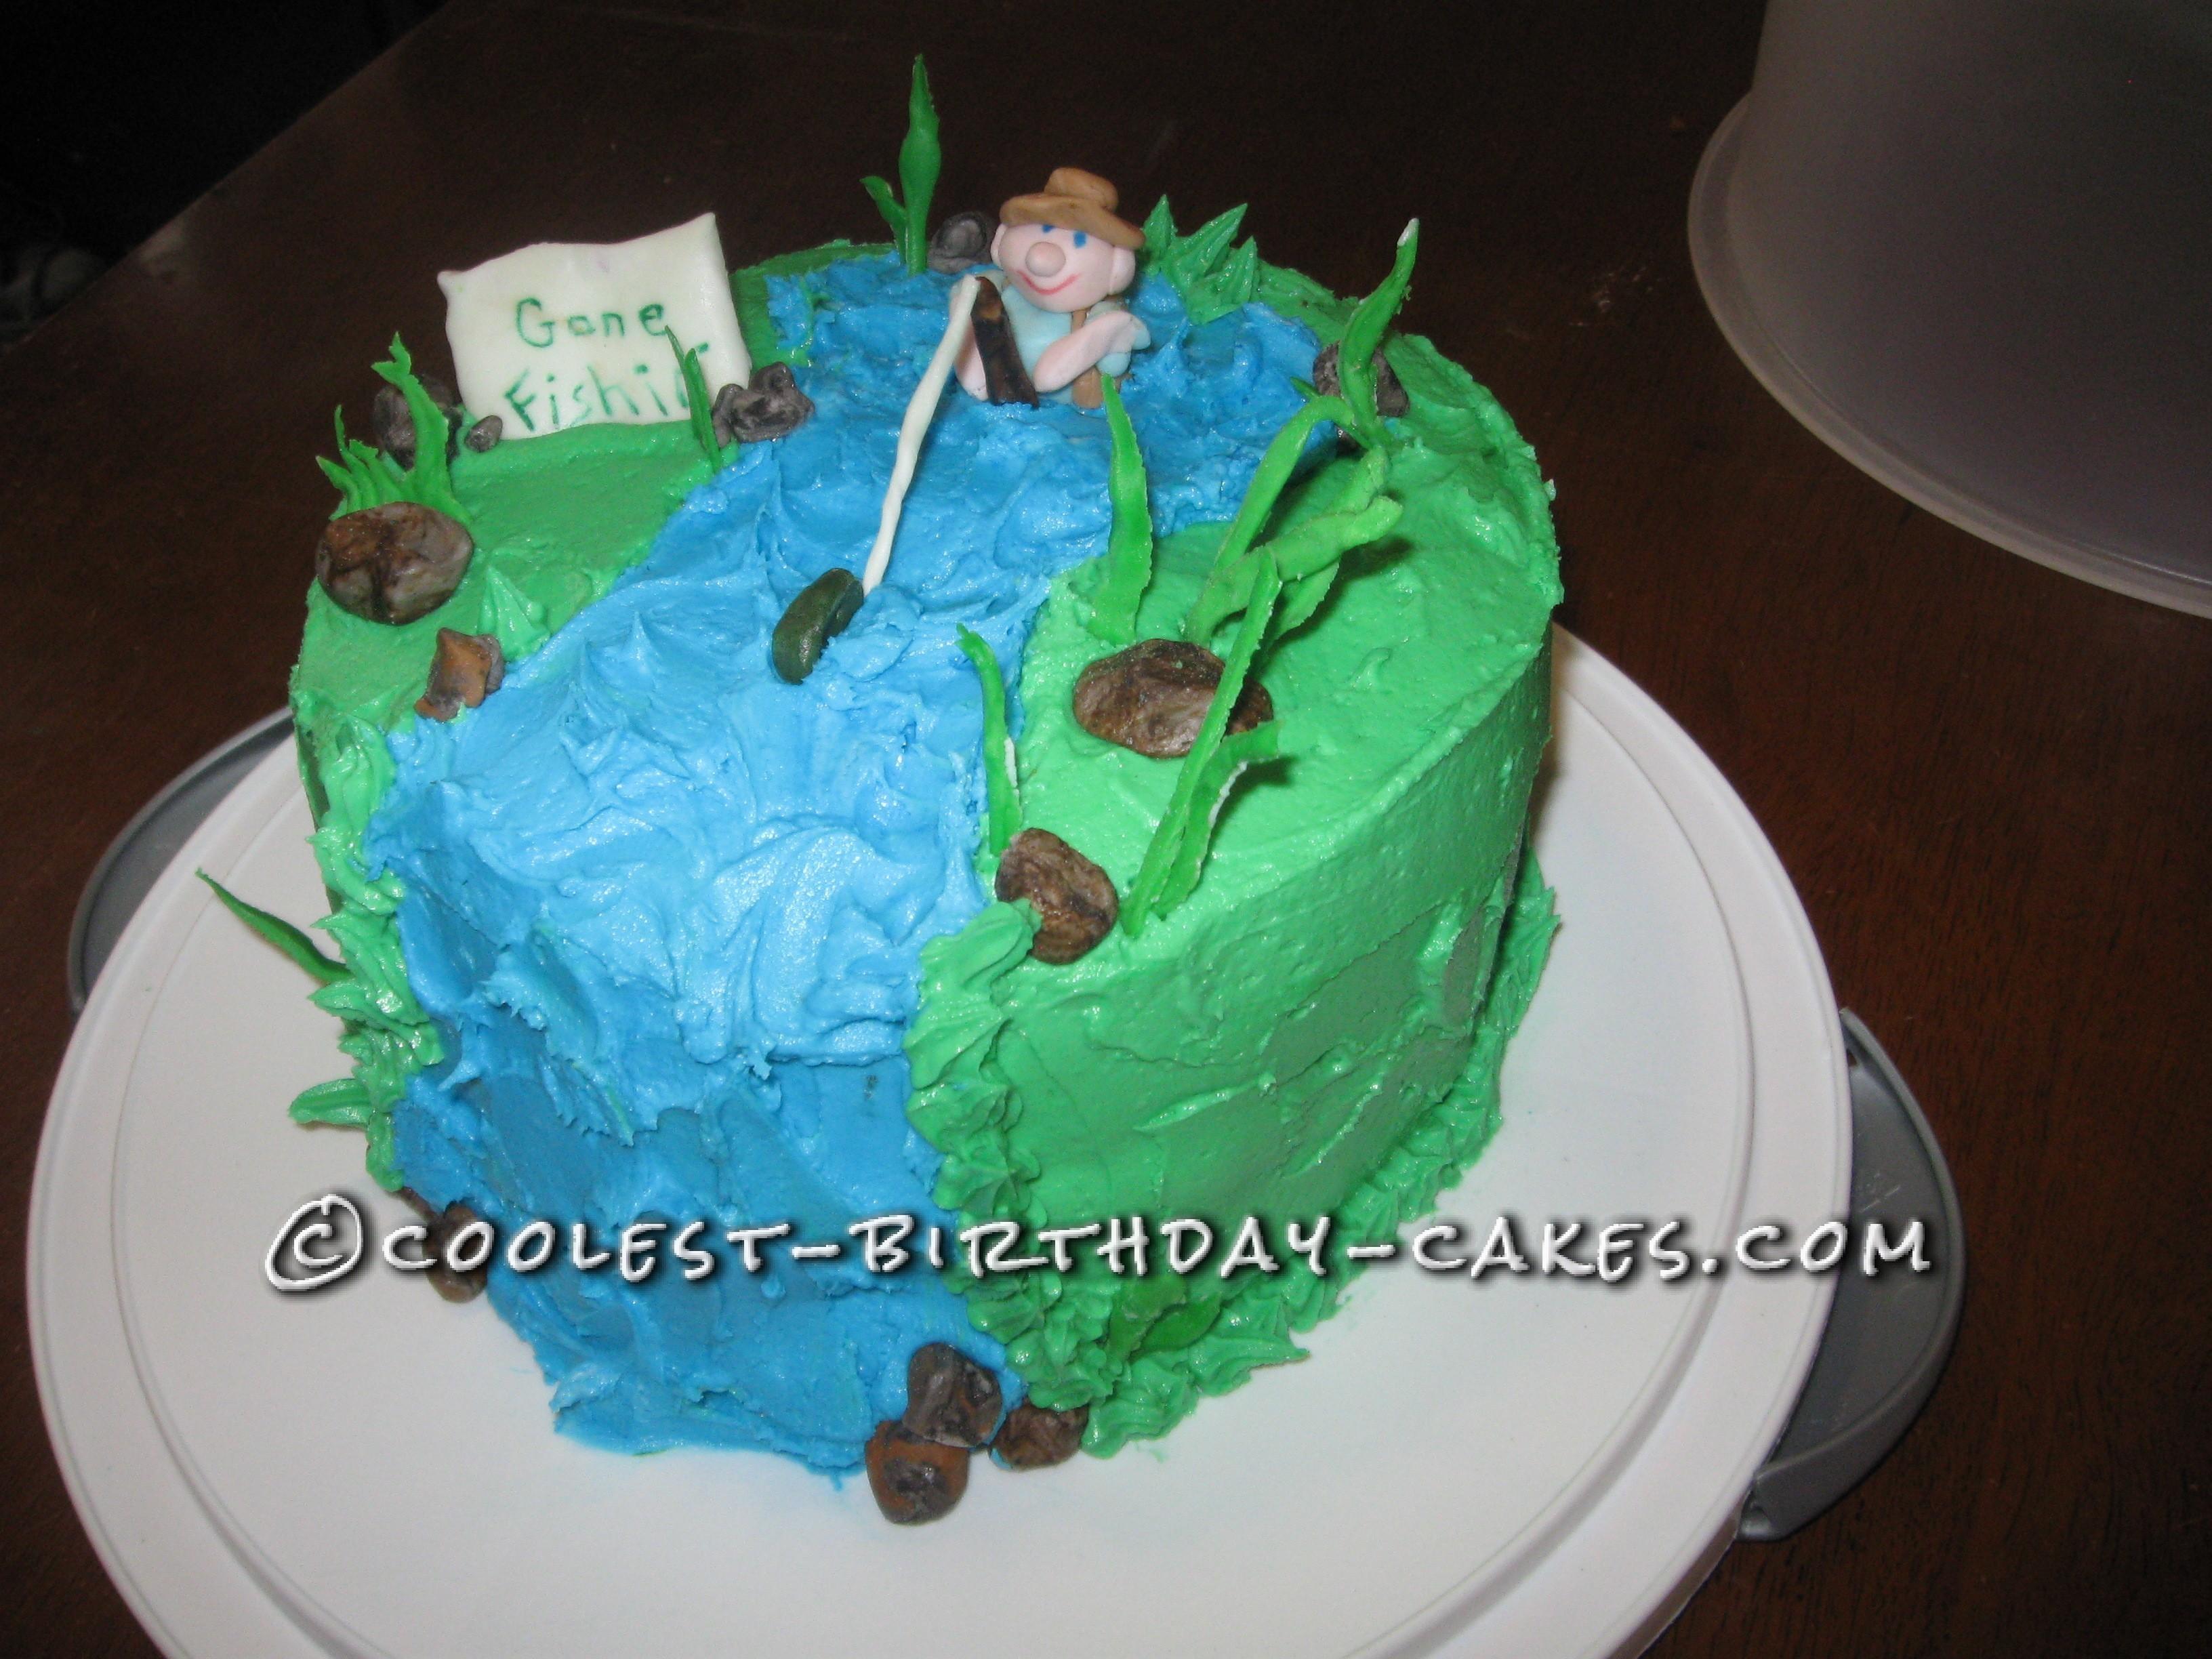 Coolest Fishing Birthday Cake